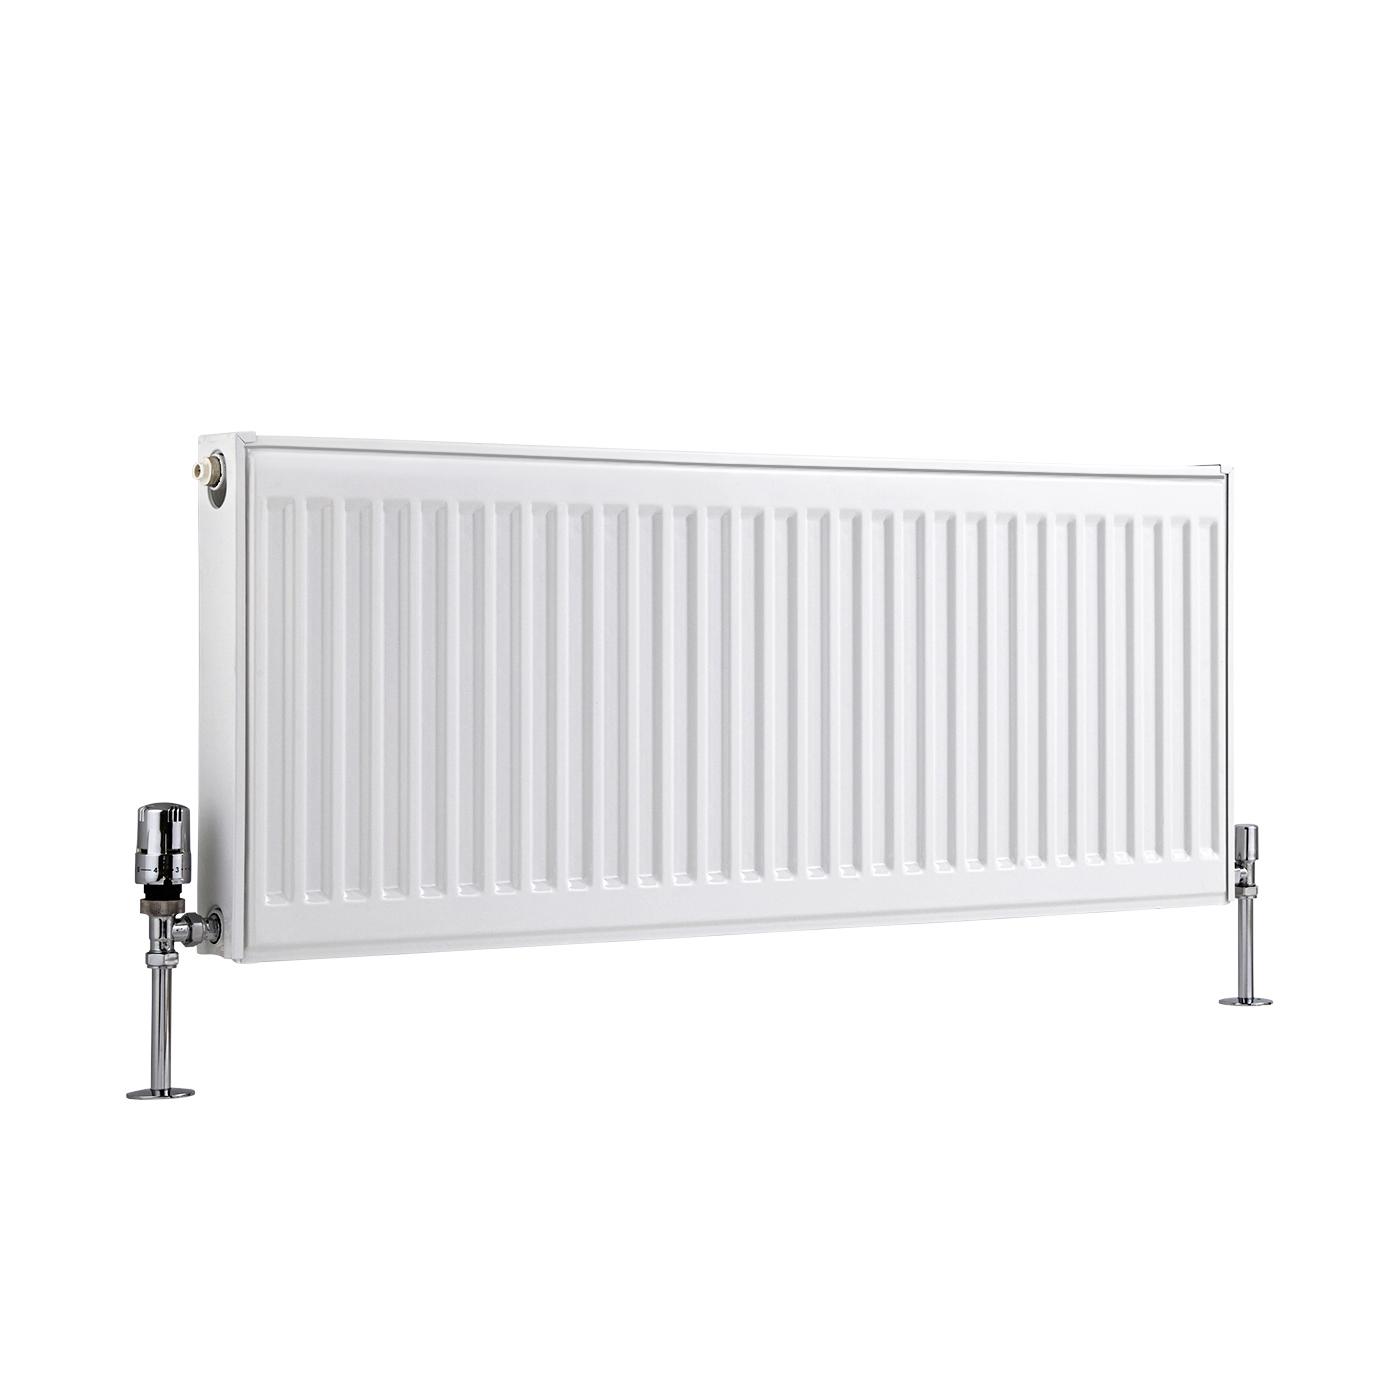 Radiateur À Panneaux Type 11 Horizontal Blanc Eco 40cm x 100cm x 5cm 683 Watts